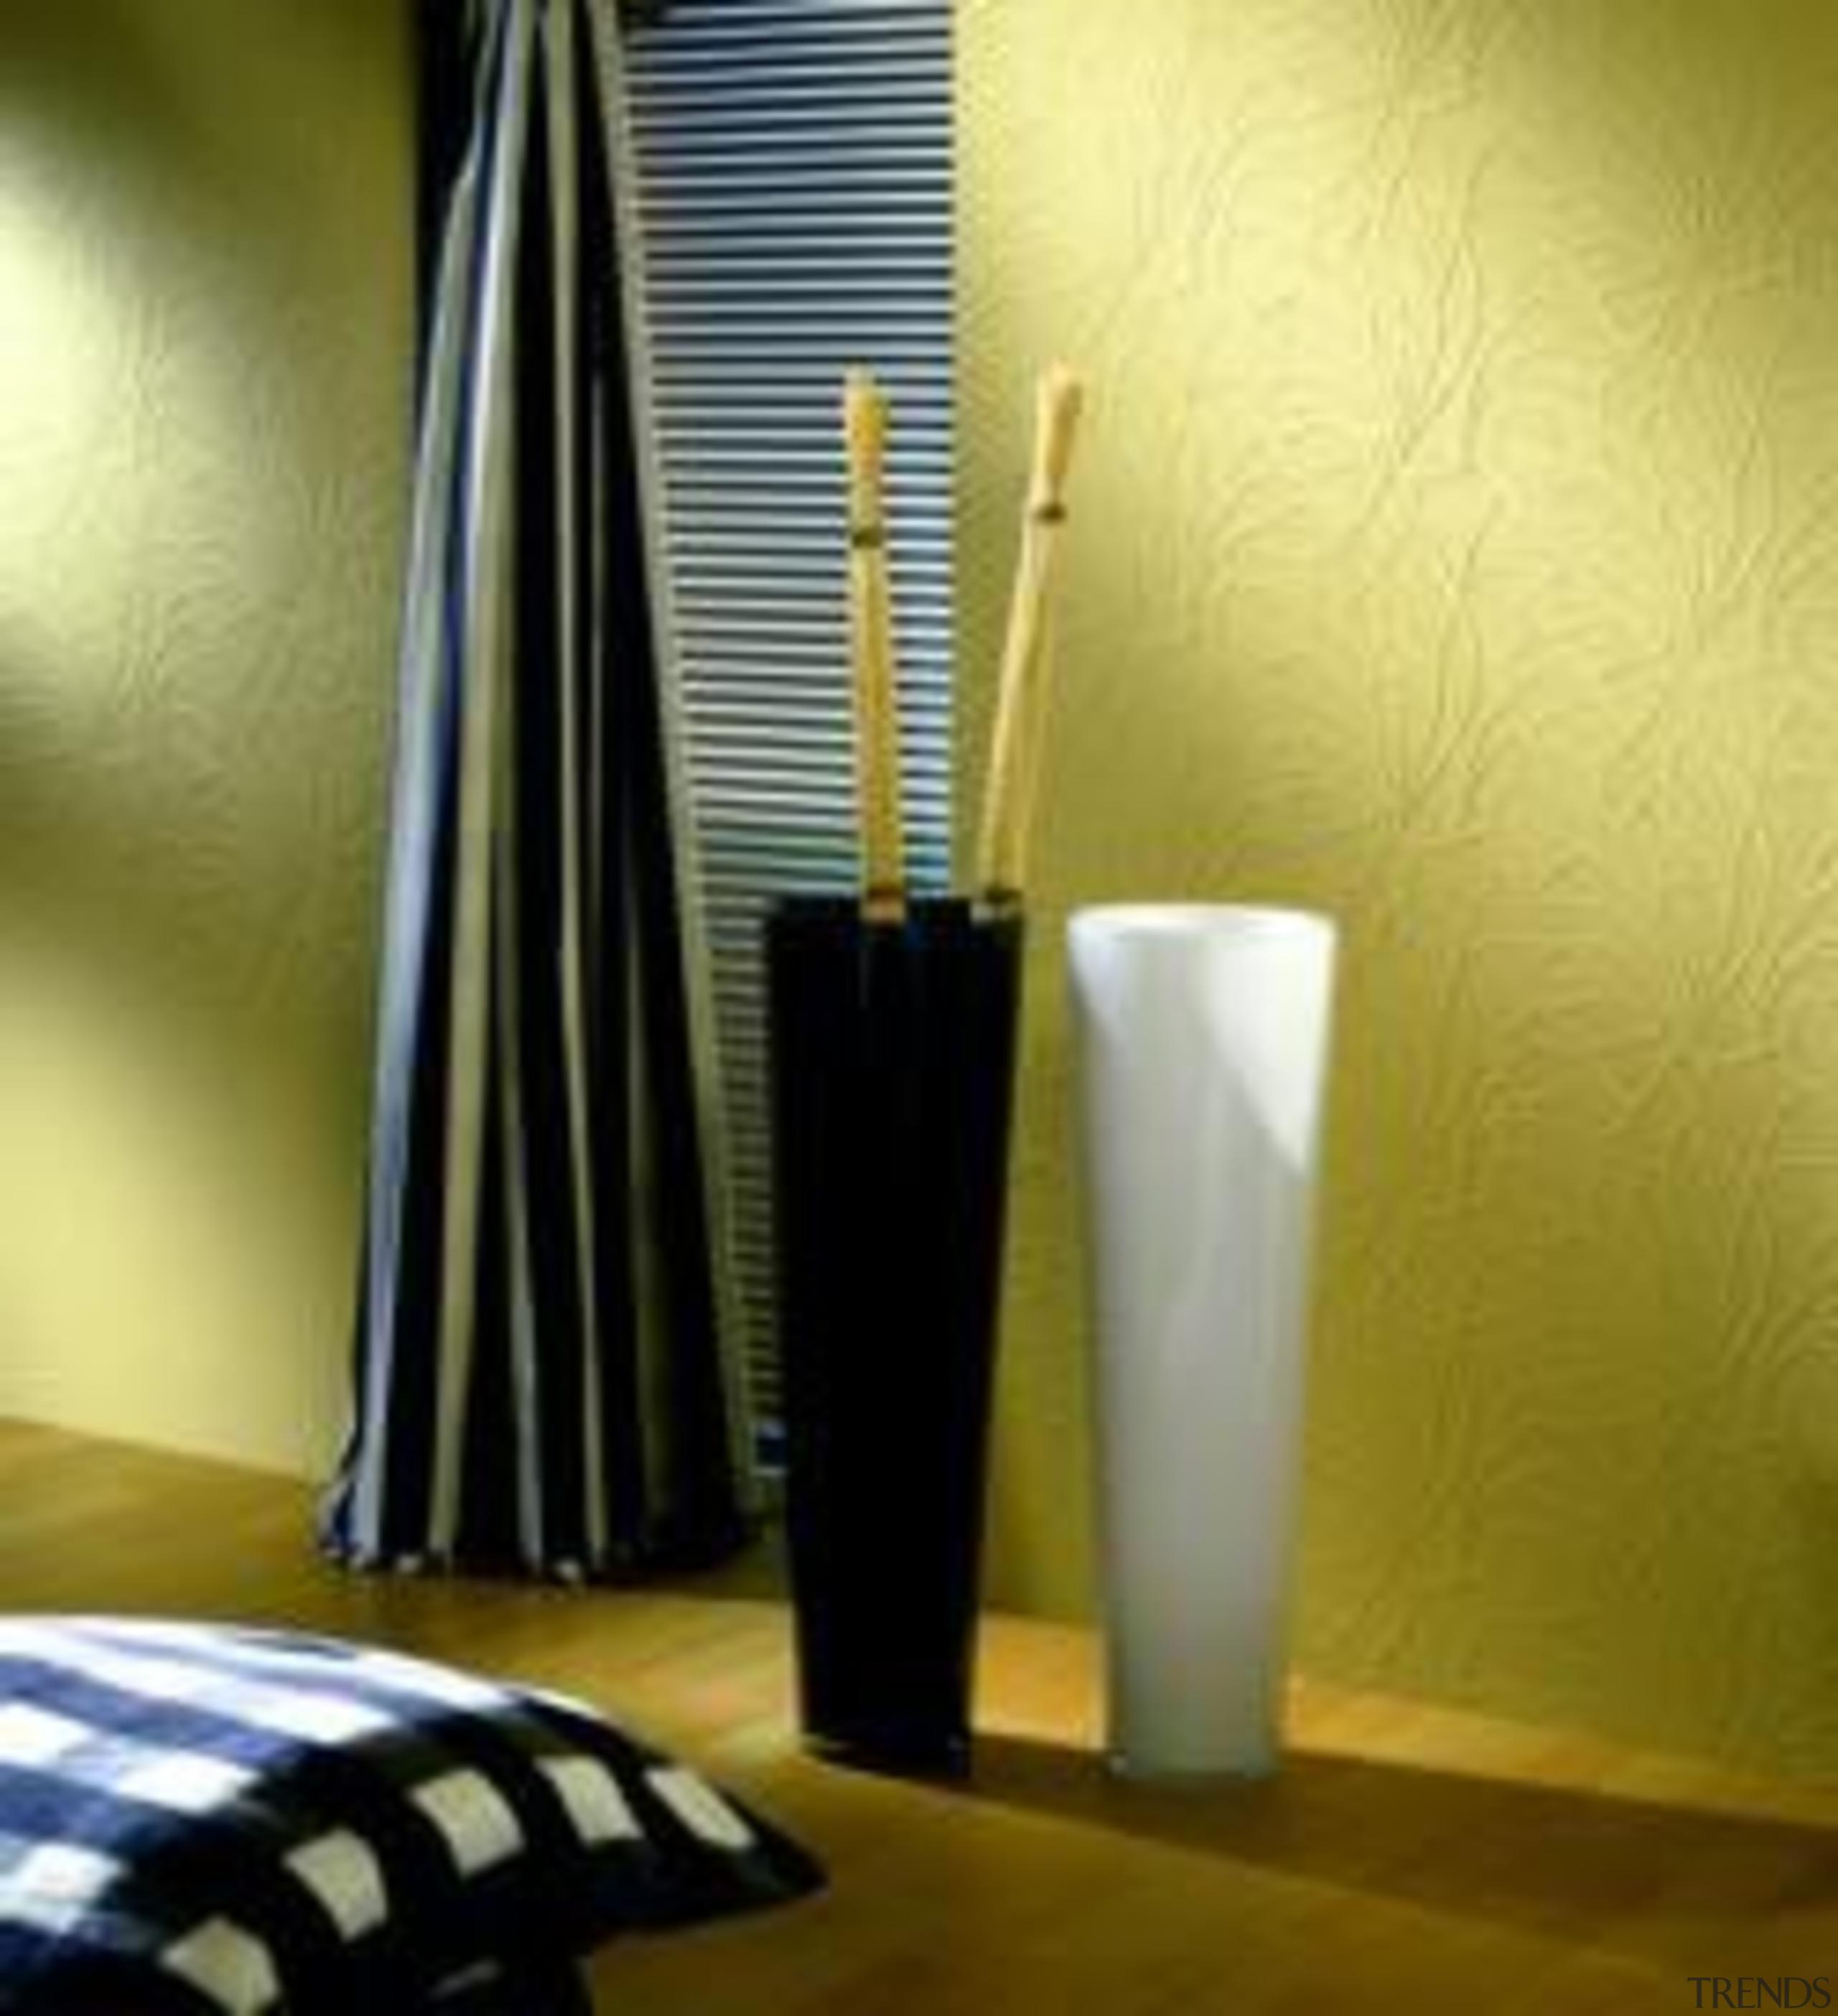 Wallton Painton Range - Wallton Painton Range - decor, floor, flooring, interior design, lamp, light, light fixture, lighting, lighting accessory, product design, table, wall, brown, yellow